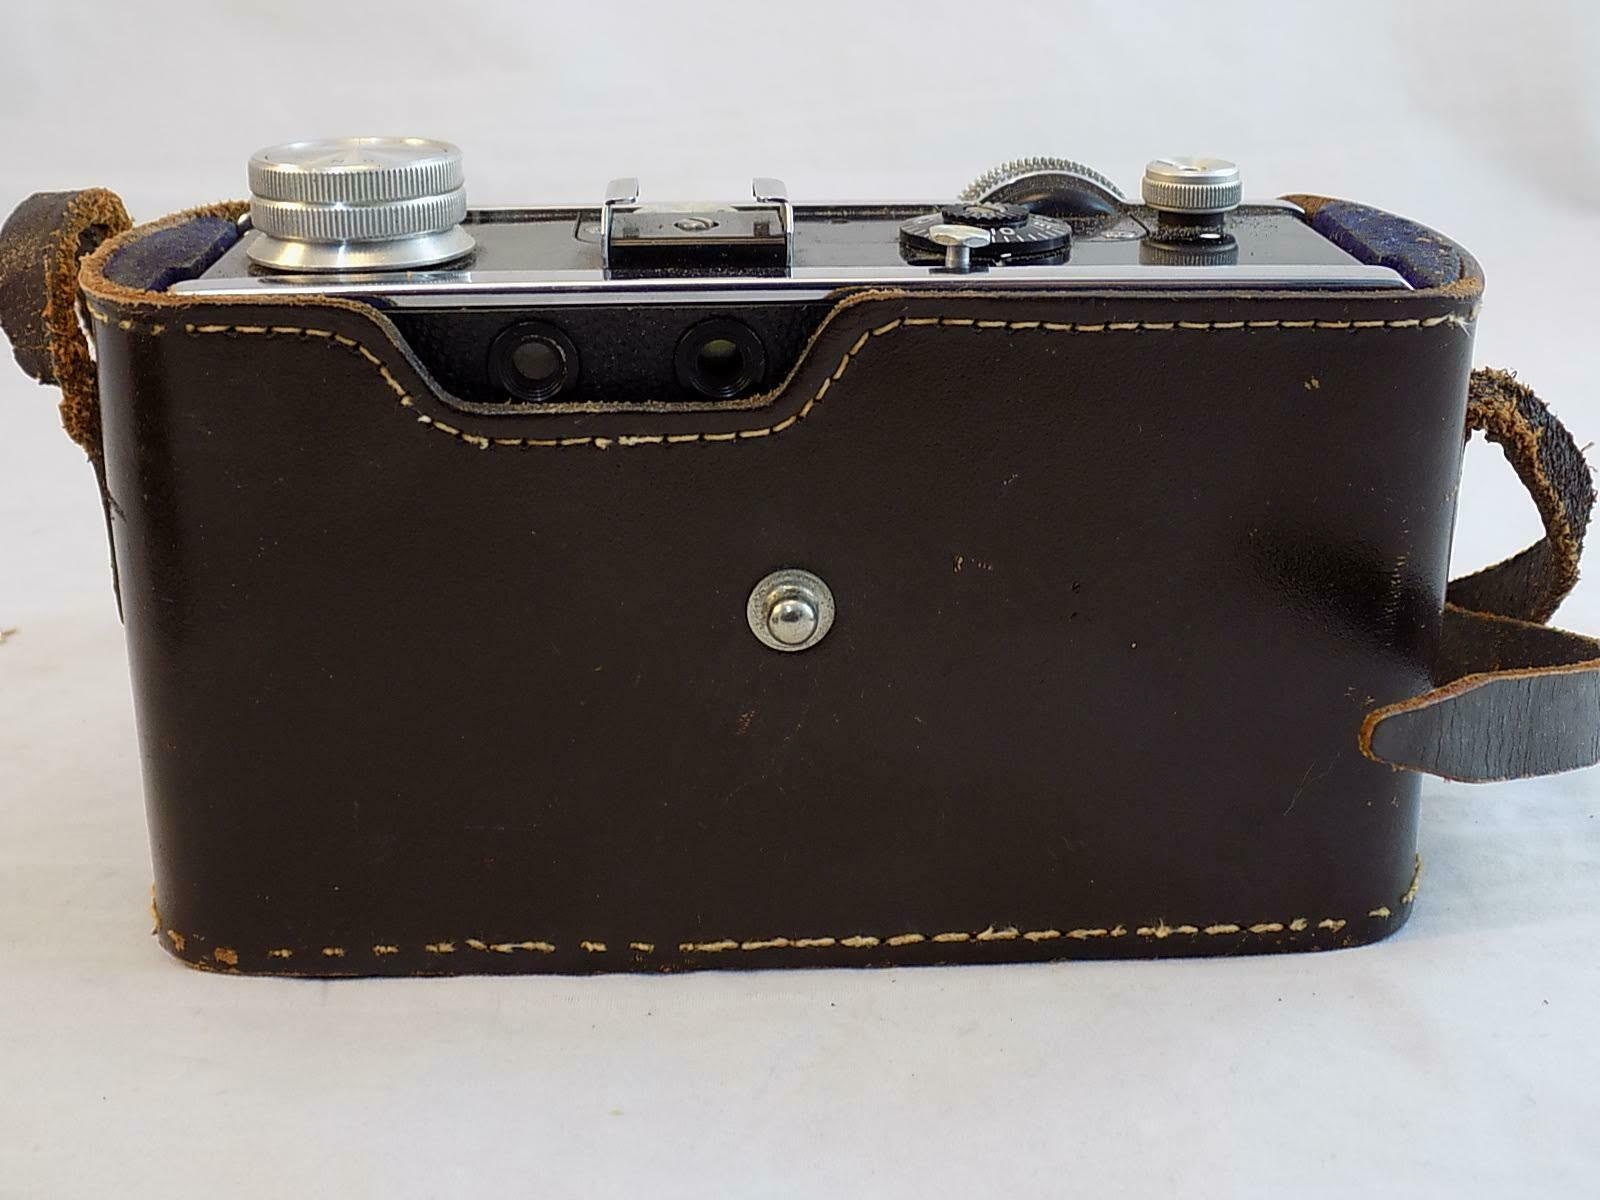 ARGUS C3 CAMERA 1955 VINTAGE 50m COLOR-MATIC W/COATED CINTAR LENS & LEATHER CASE